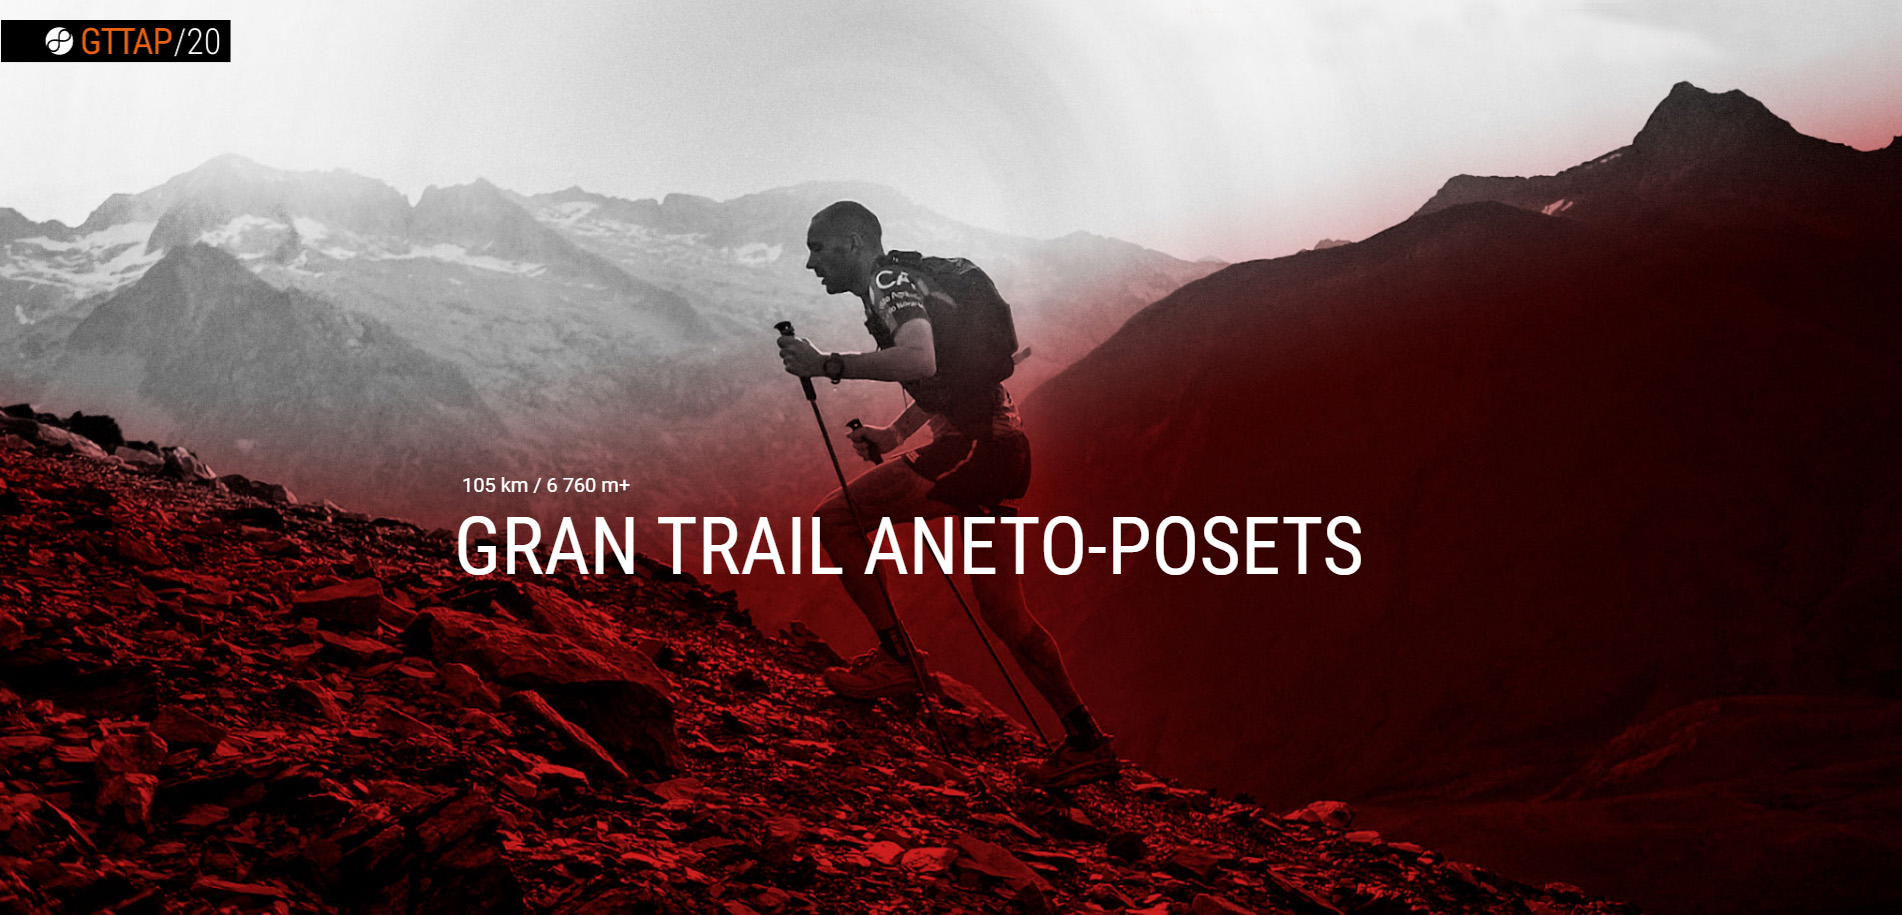 Grand Trail ANETO-POSETS